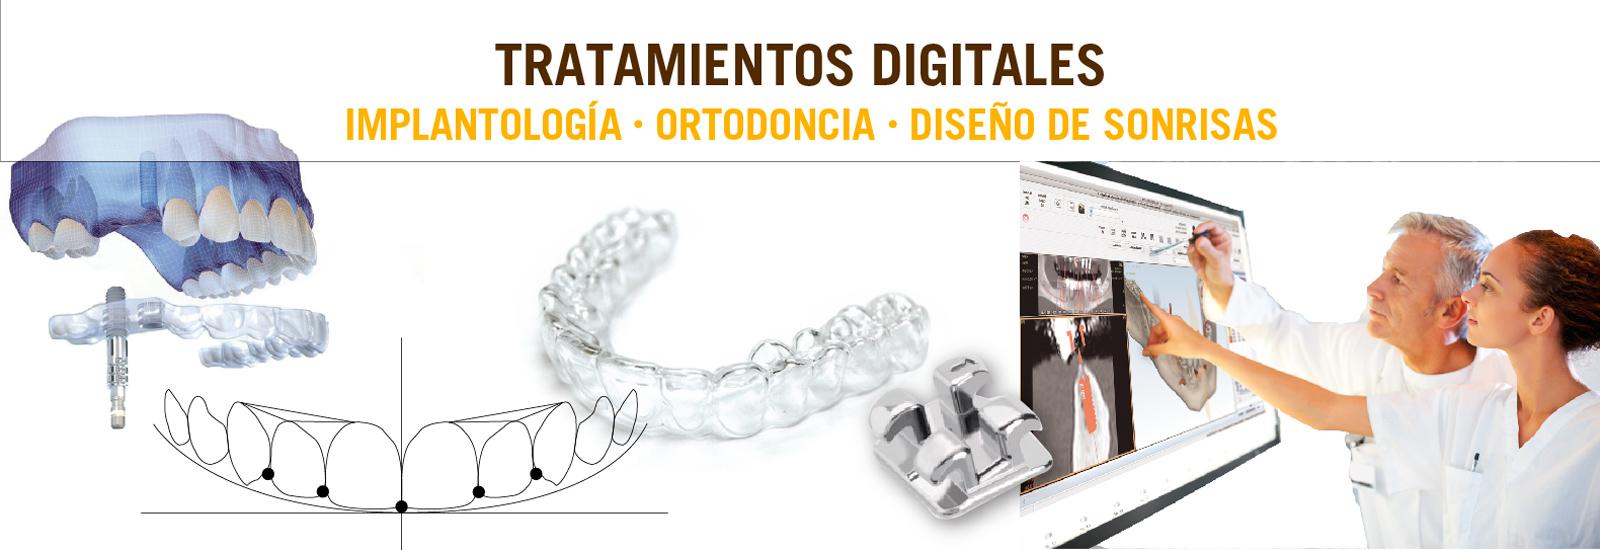 SLIDER-6-Tratamiento-Digitales-abril